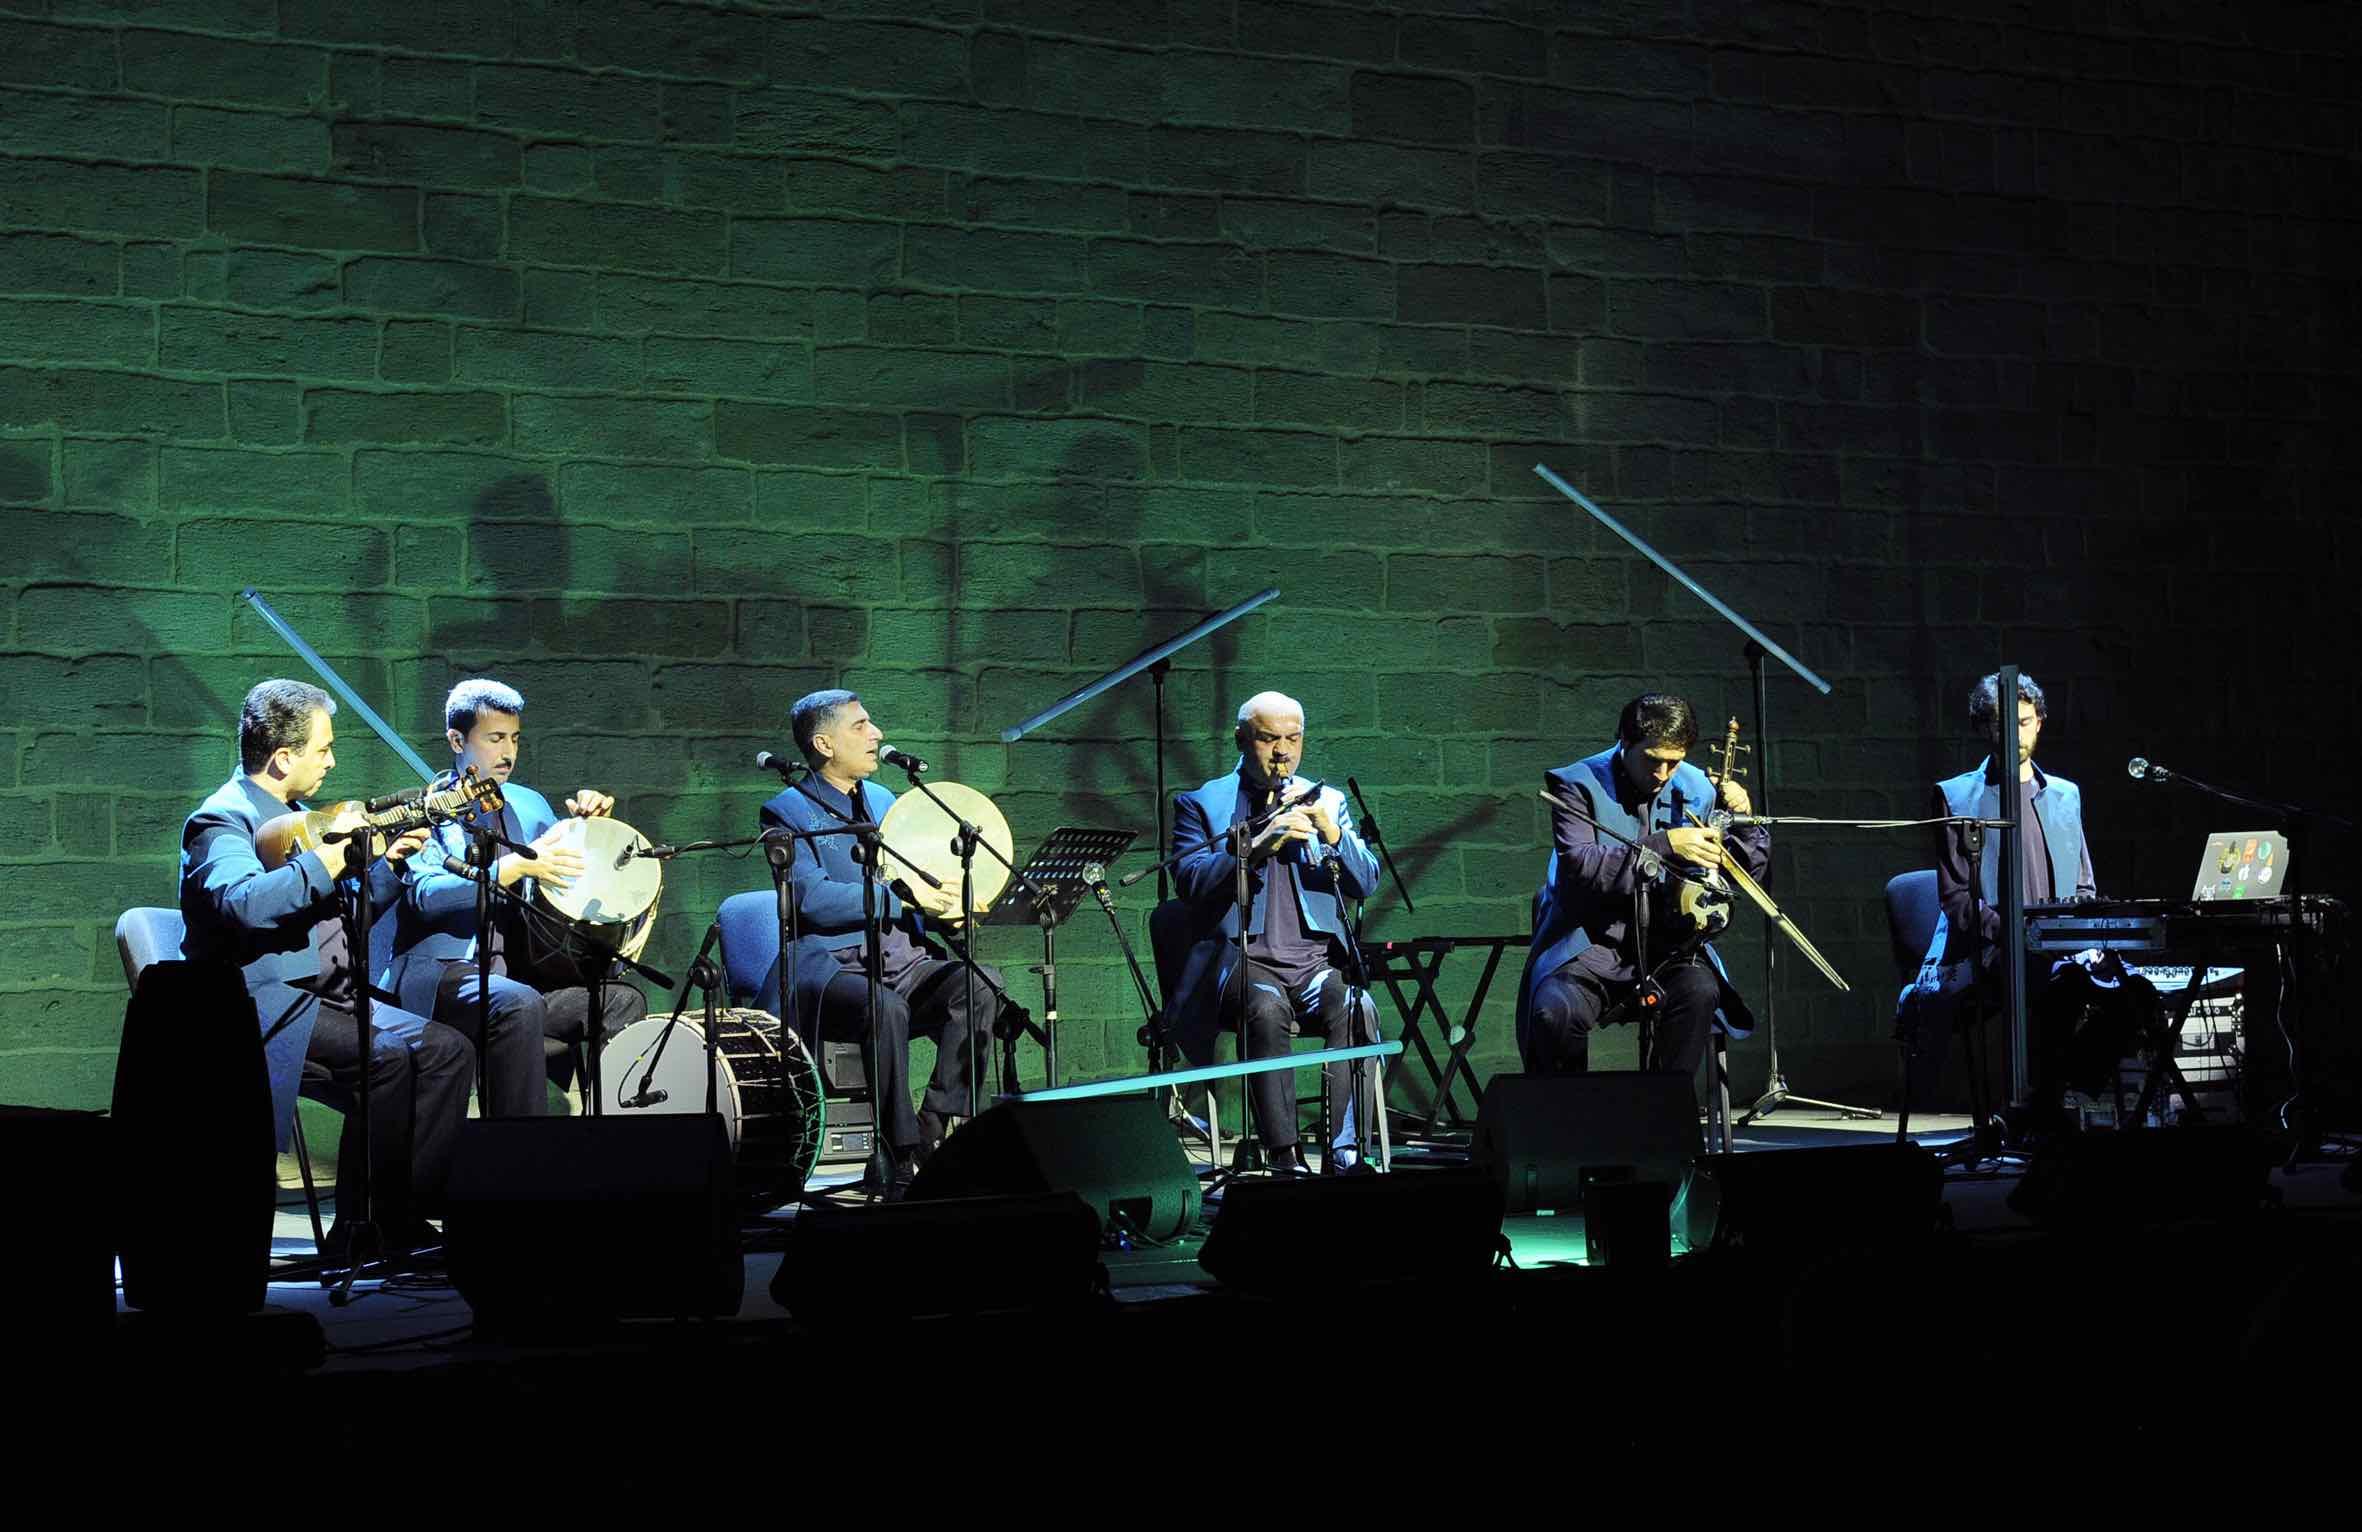 "Photo of فاس عند ملتقى الثقافات"" شعار المهرجان الدولي للموسيقى الروحية لهاته السنة"